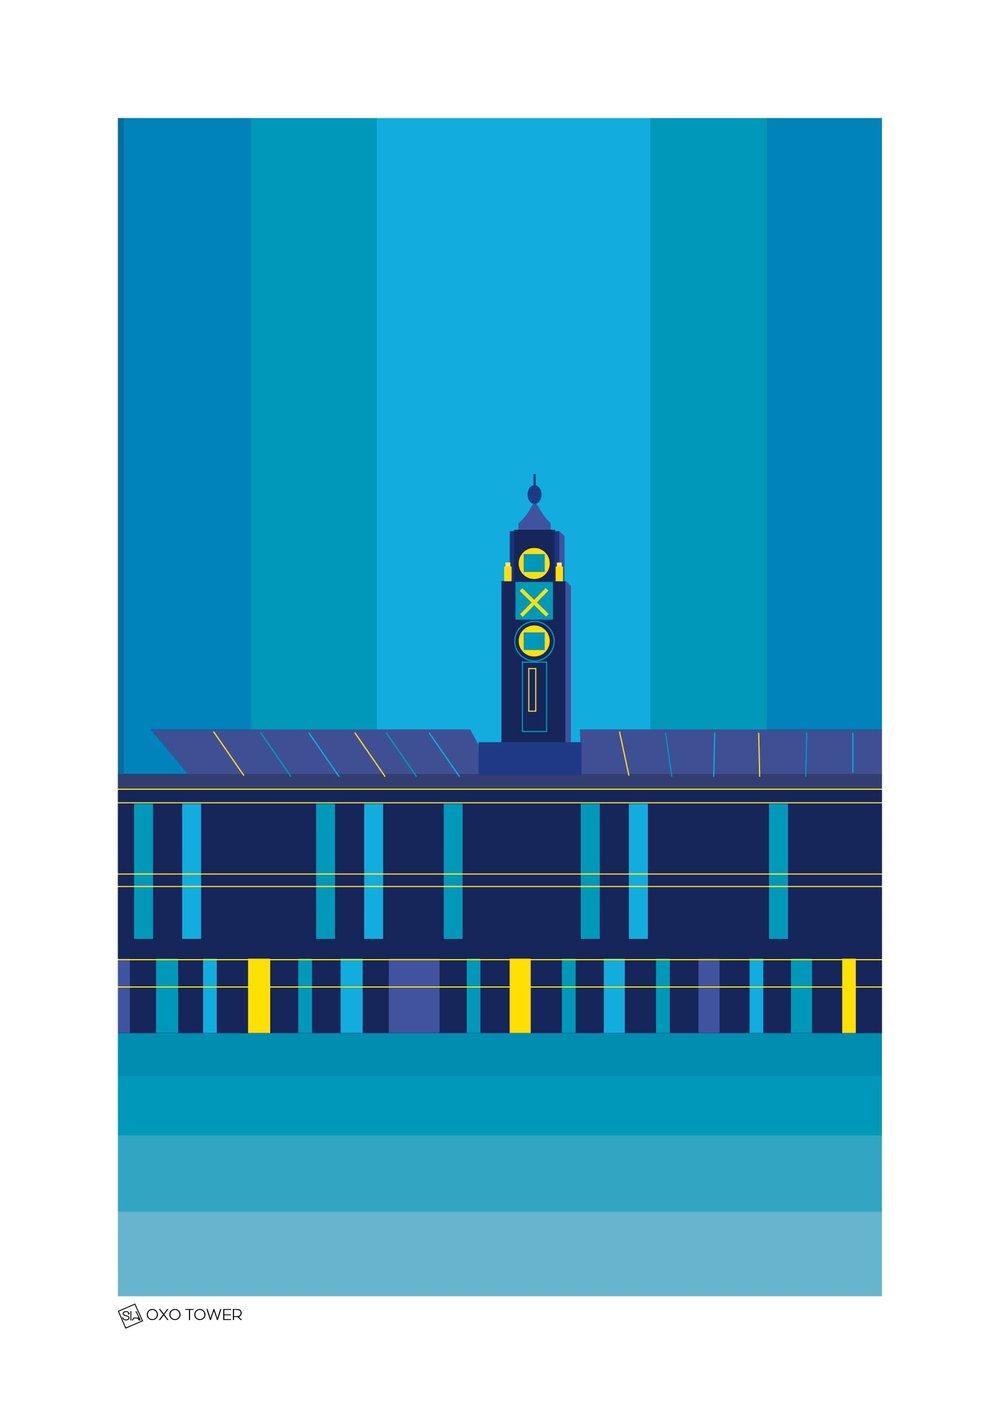 London 100_42_Oxo Tower Sunshine.jpg